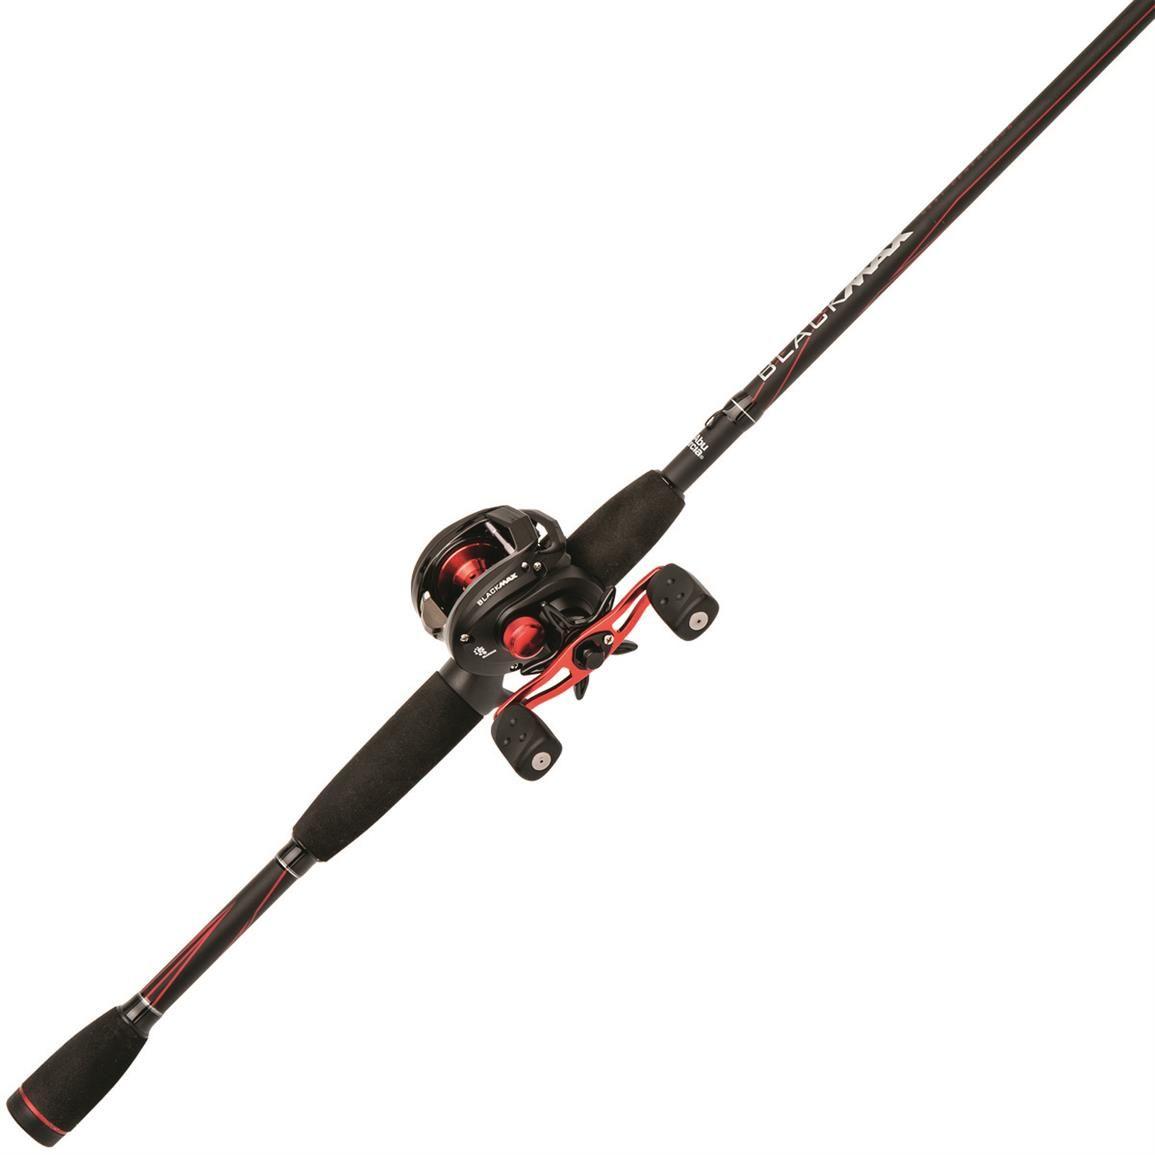 Abu garcia black max baitcasting rod and reel combo